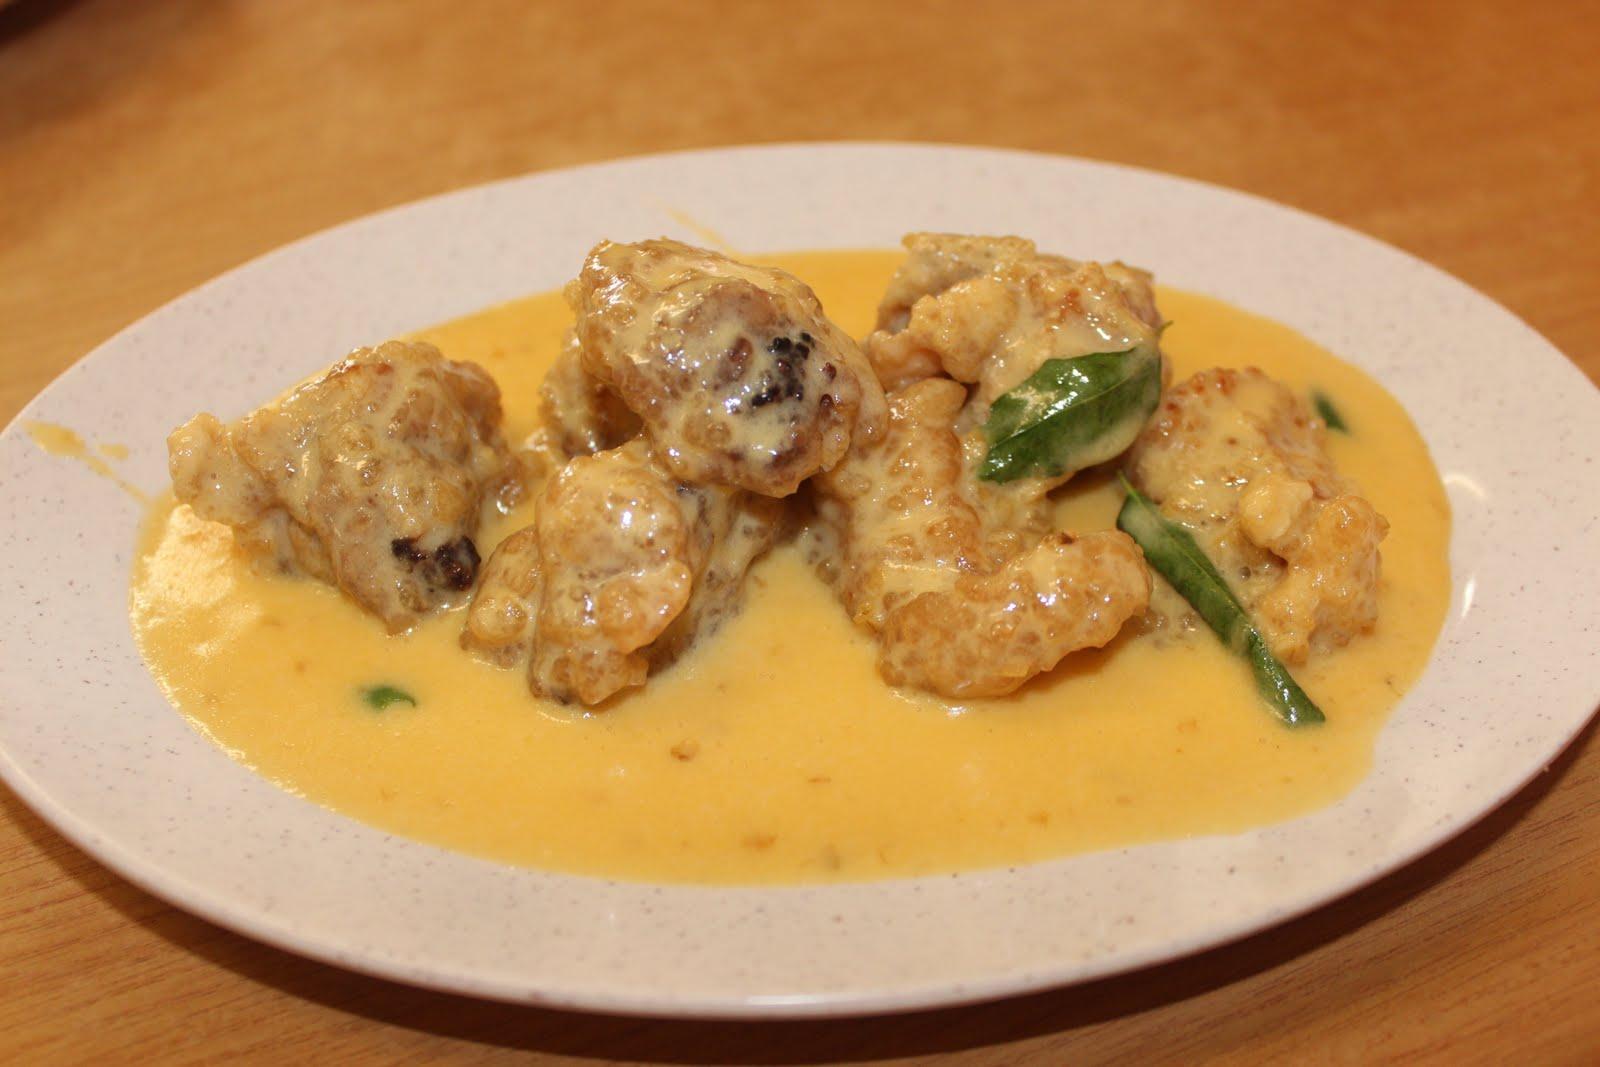 Mr mrs foodpacker chinese cuisine directory - Herve cuisine butter chicken ...